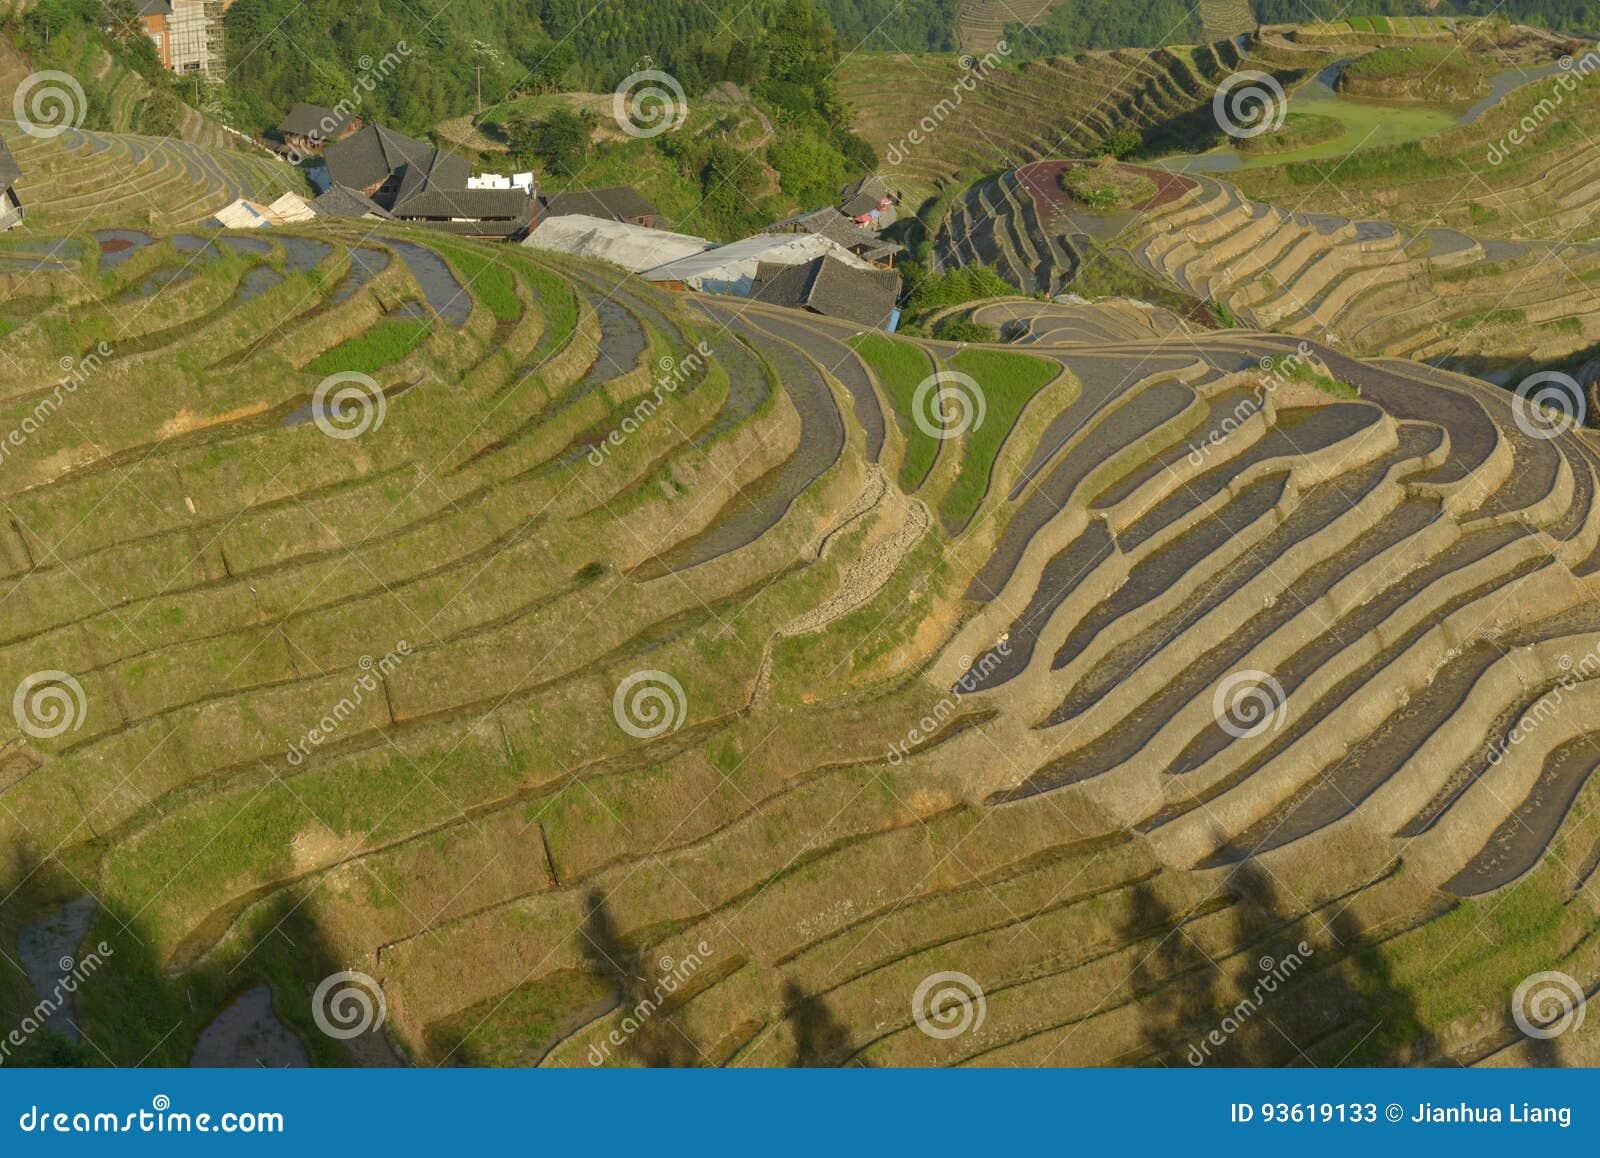 Terrasses de riz de Longji, province de Guangxi, Chine